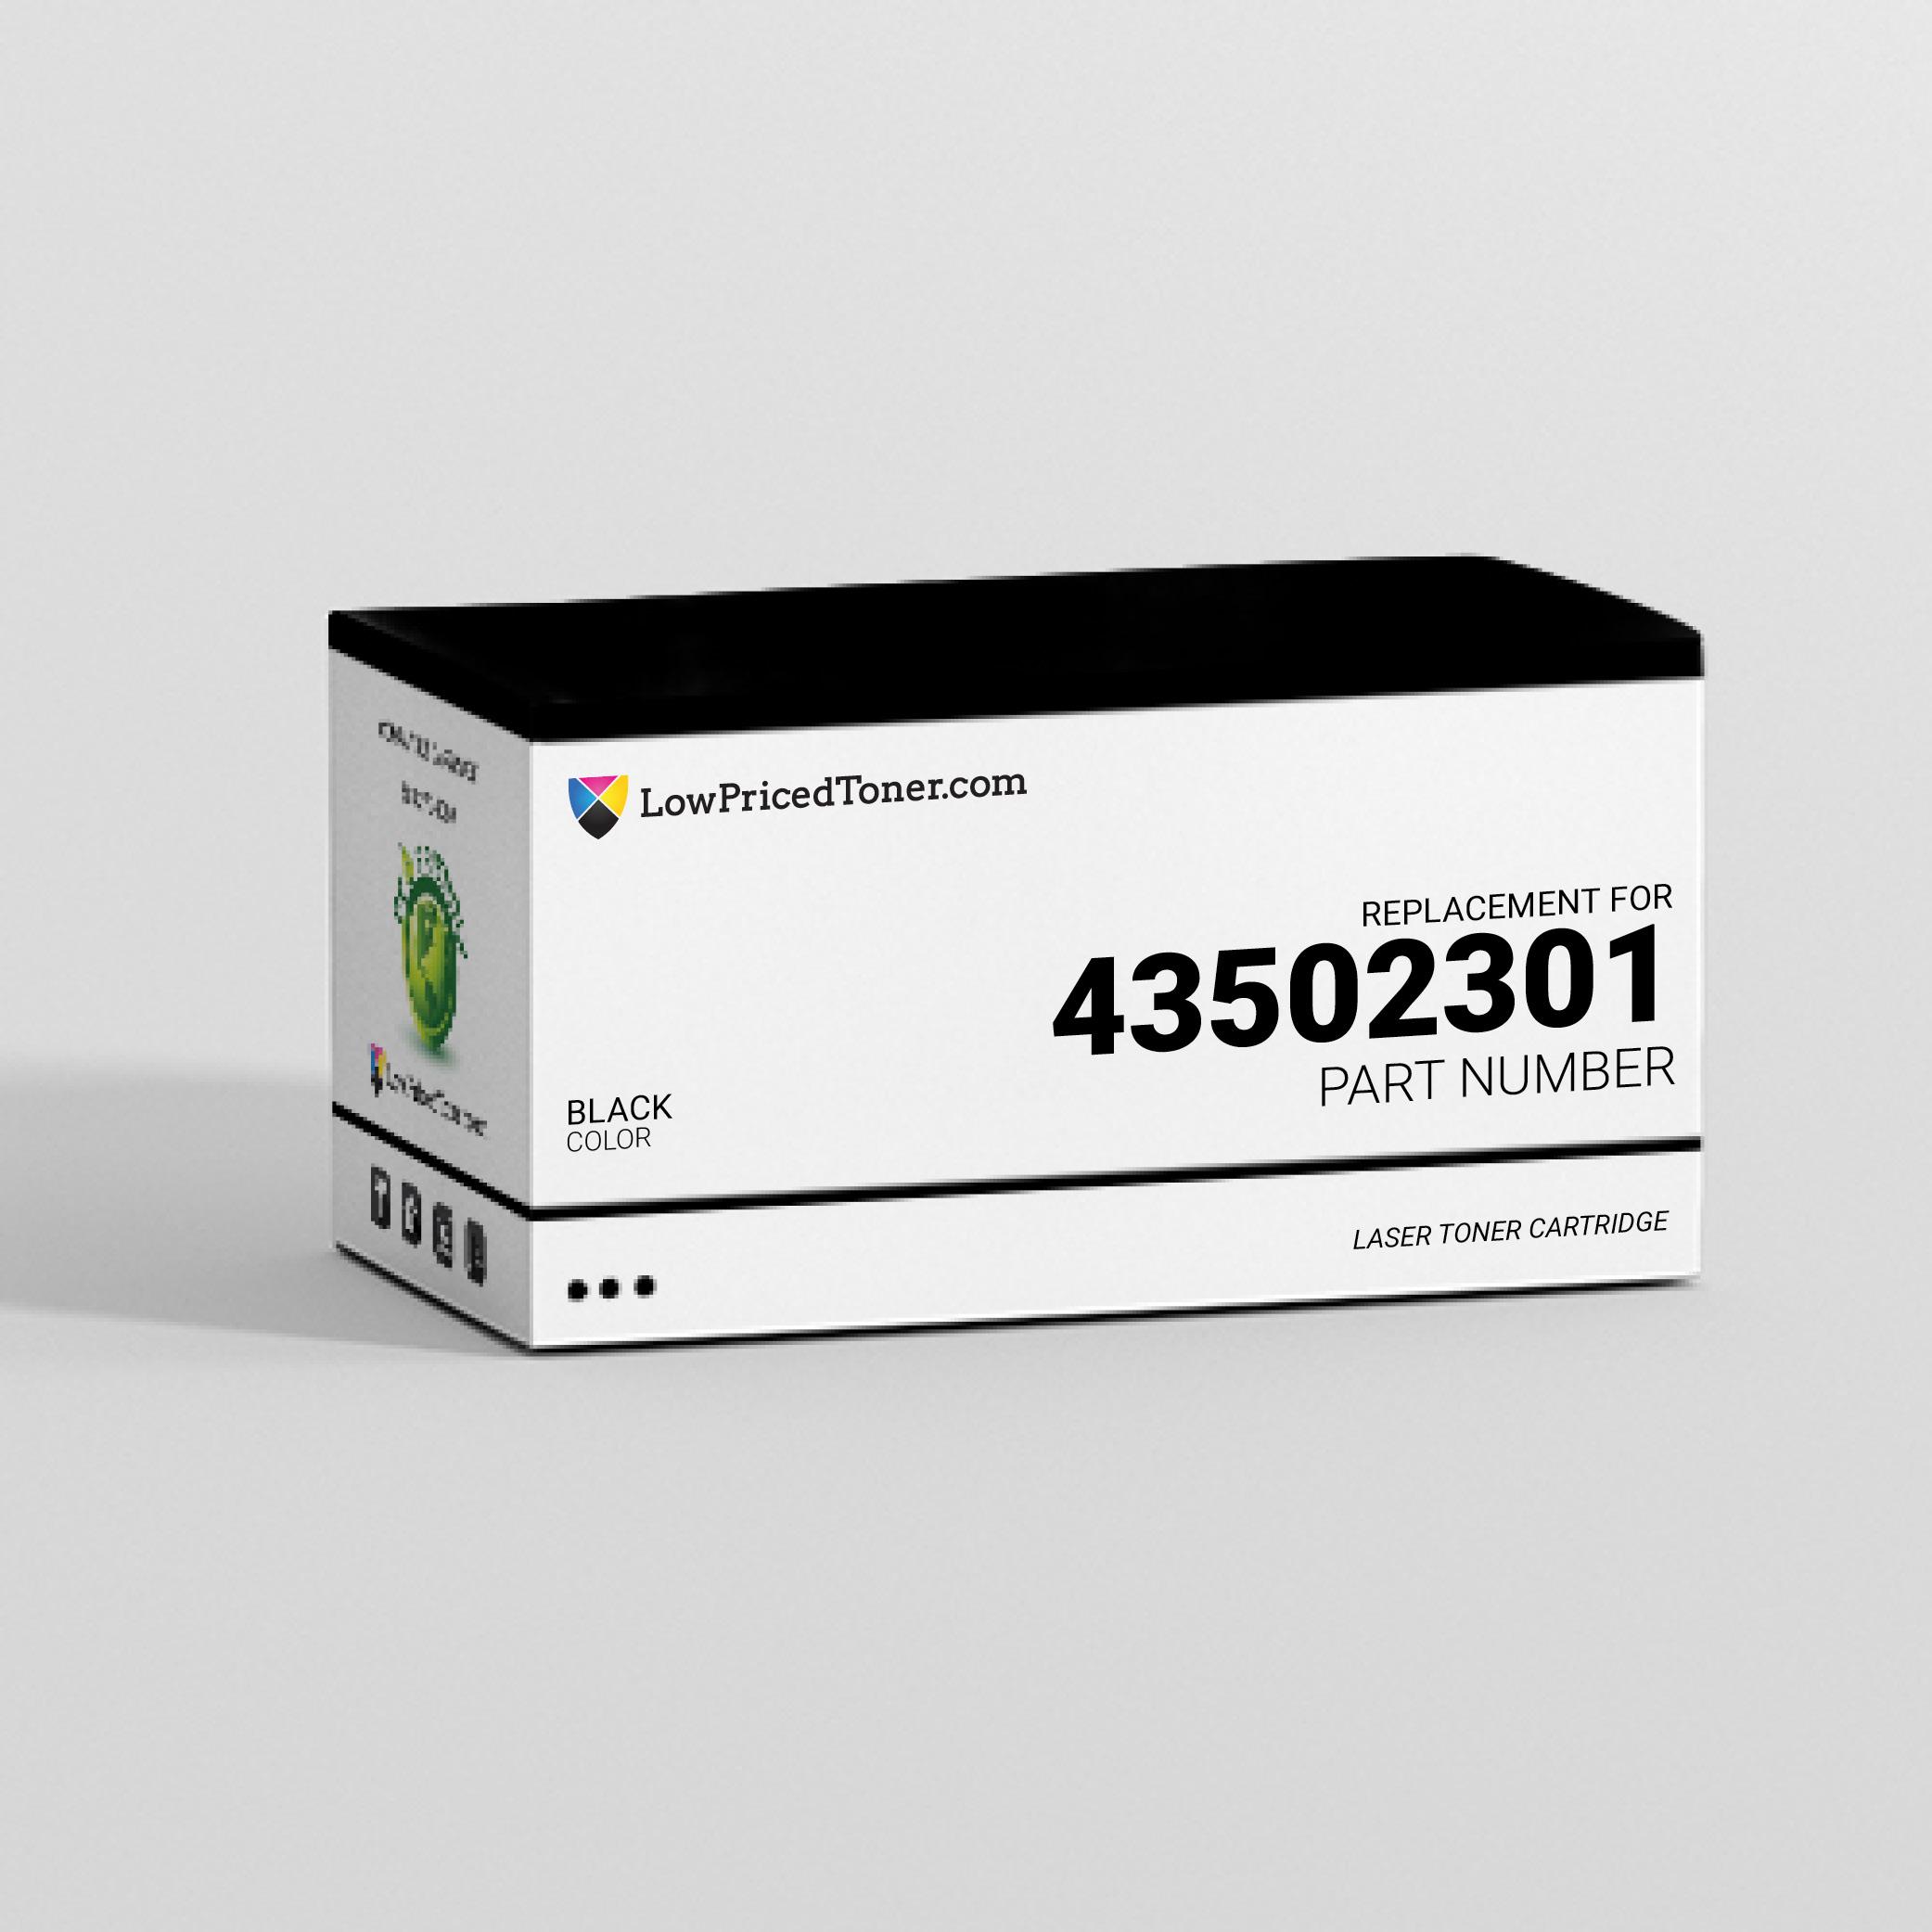 Okidata 43502301 Compatible Black Laser Toner Cartridge